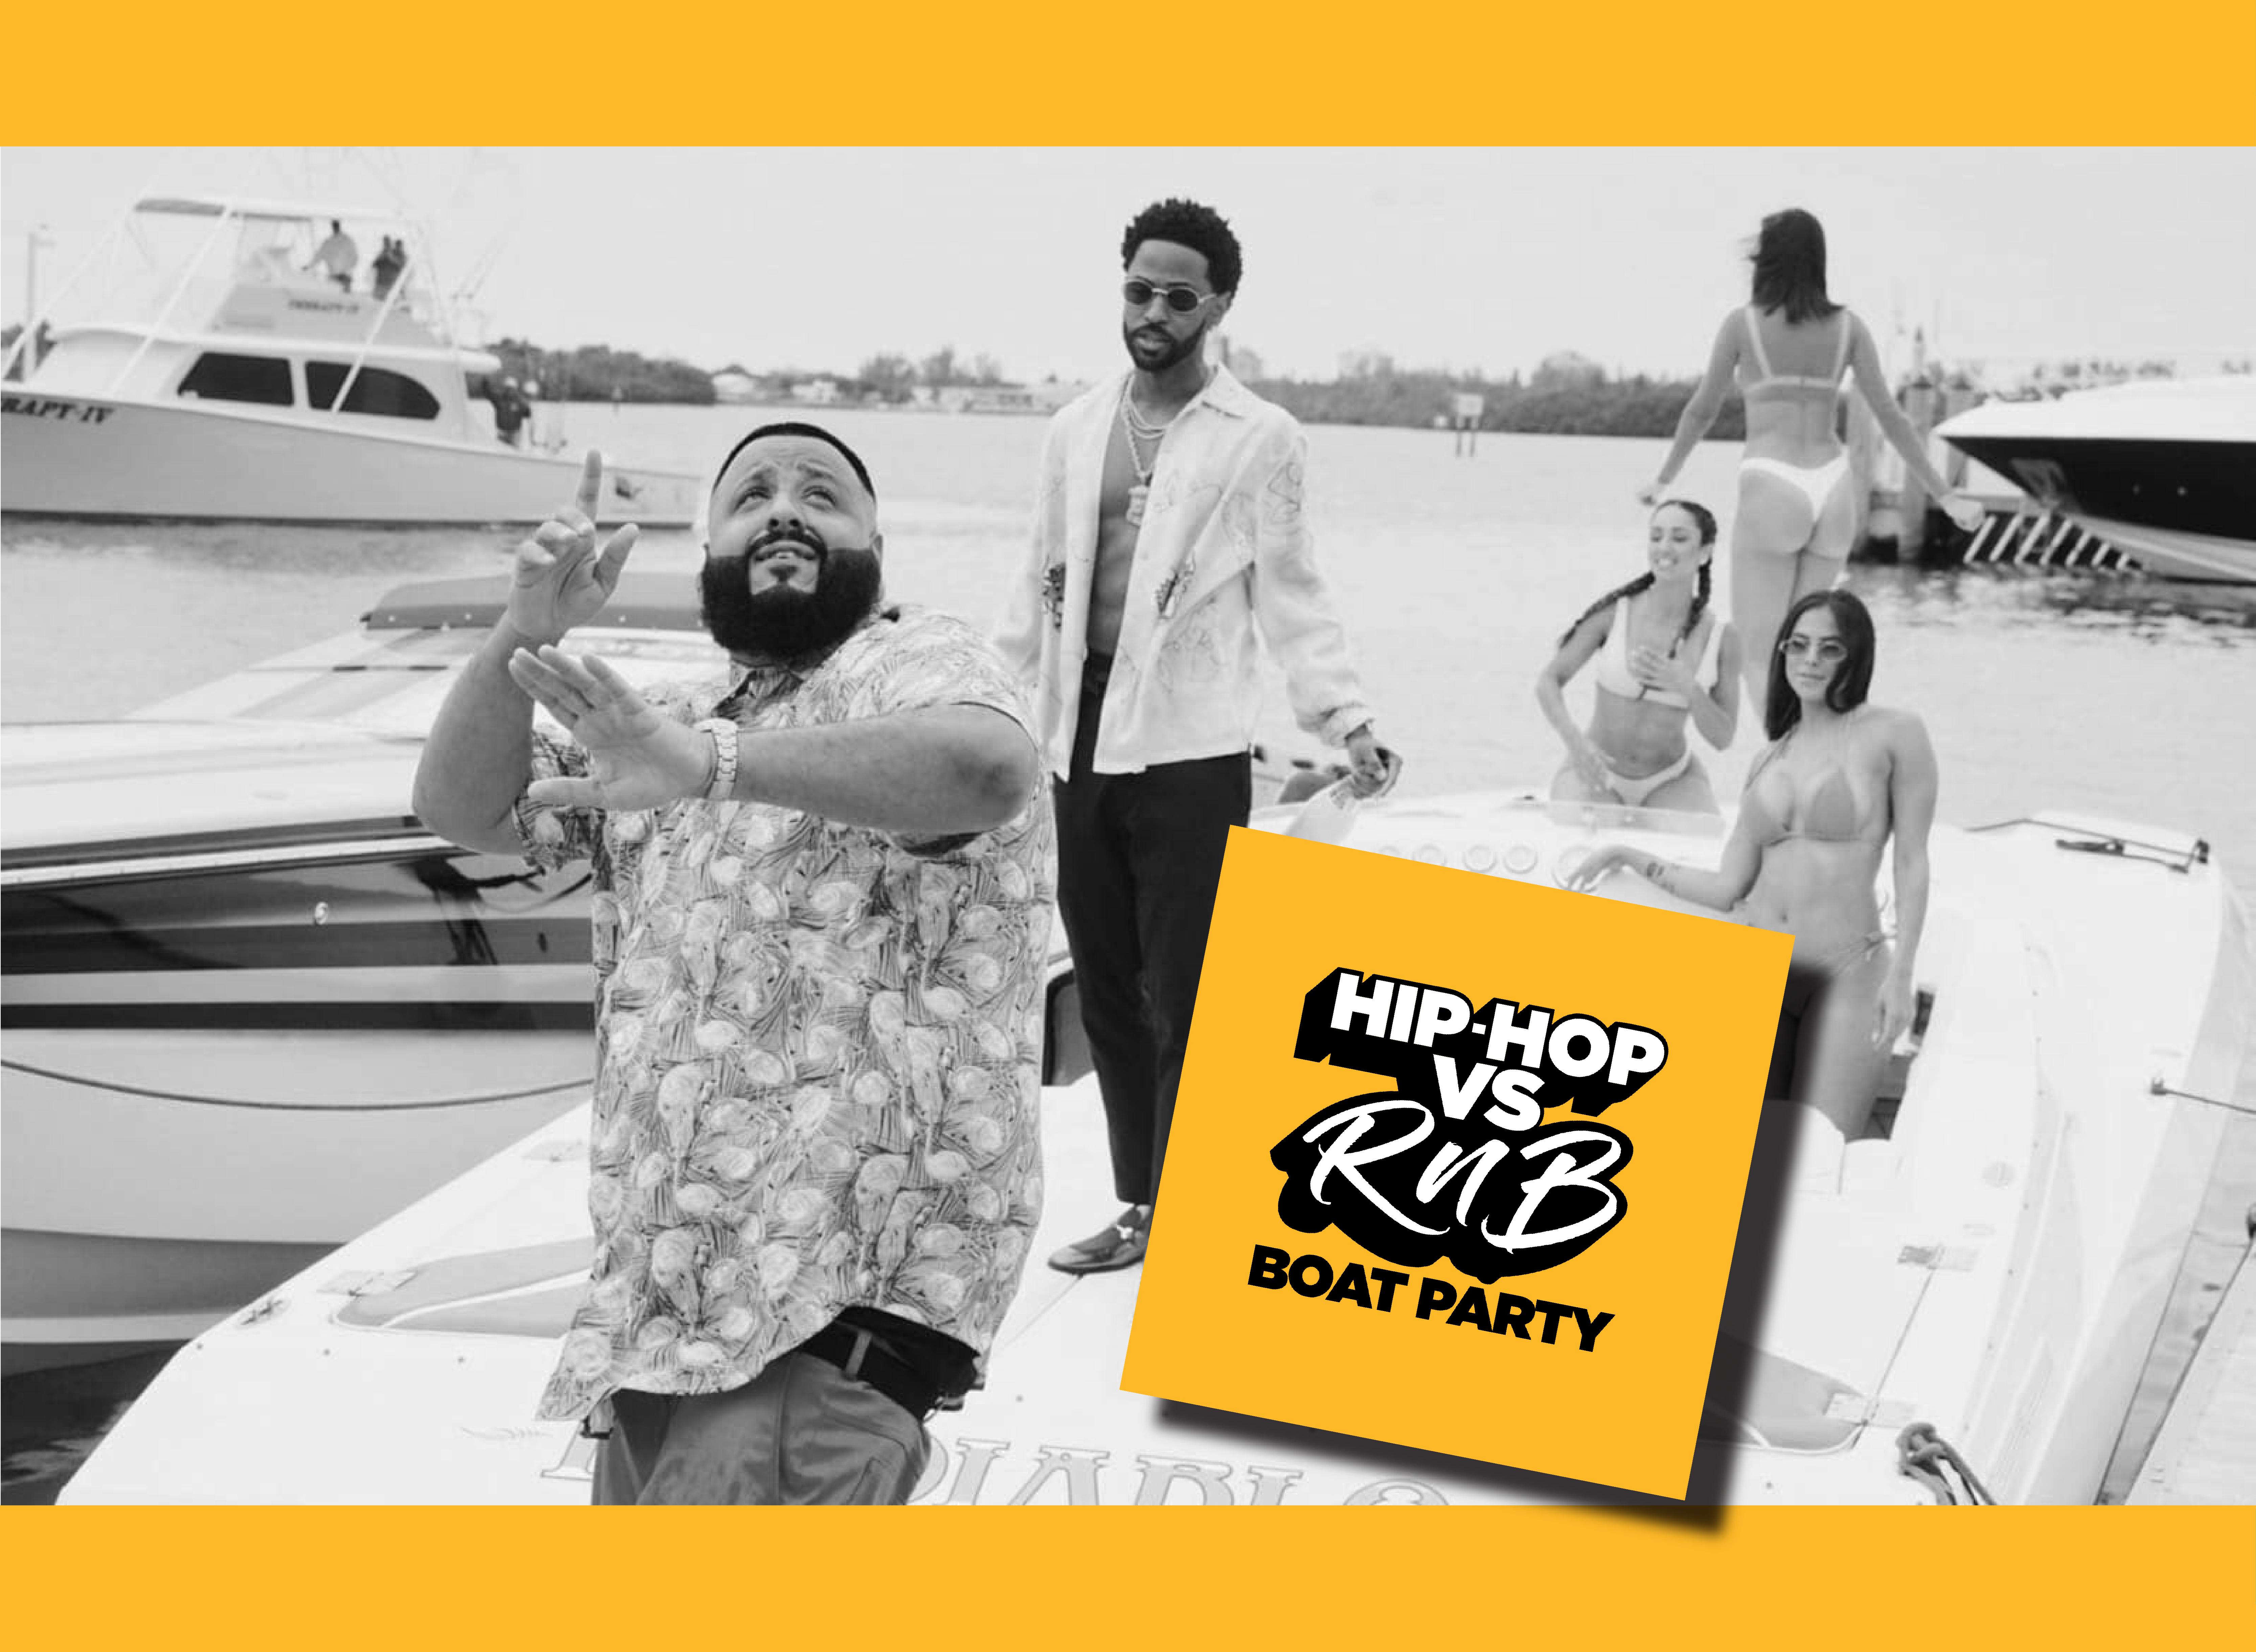 Hip-Hop vs RnB Boat Party